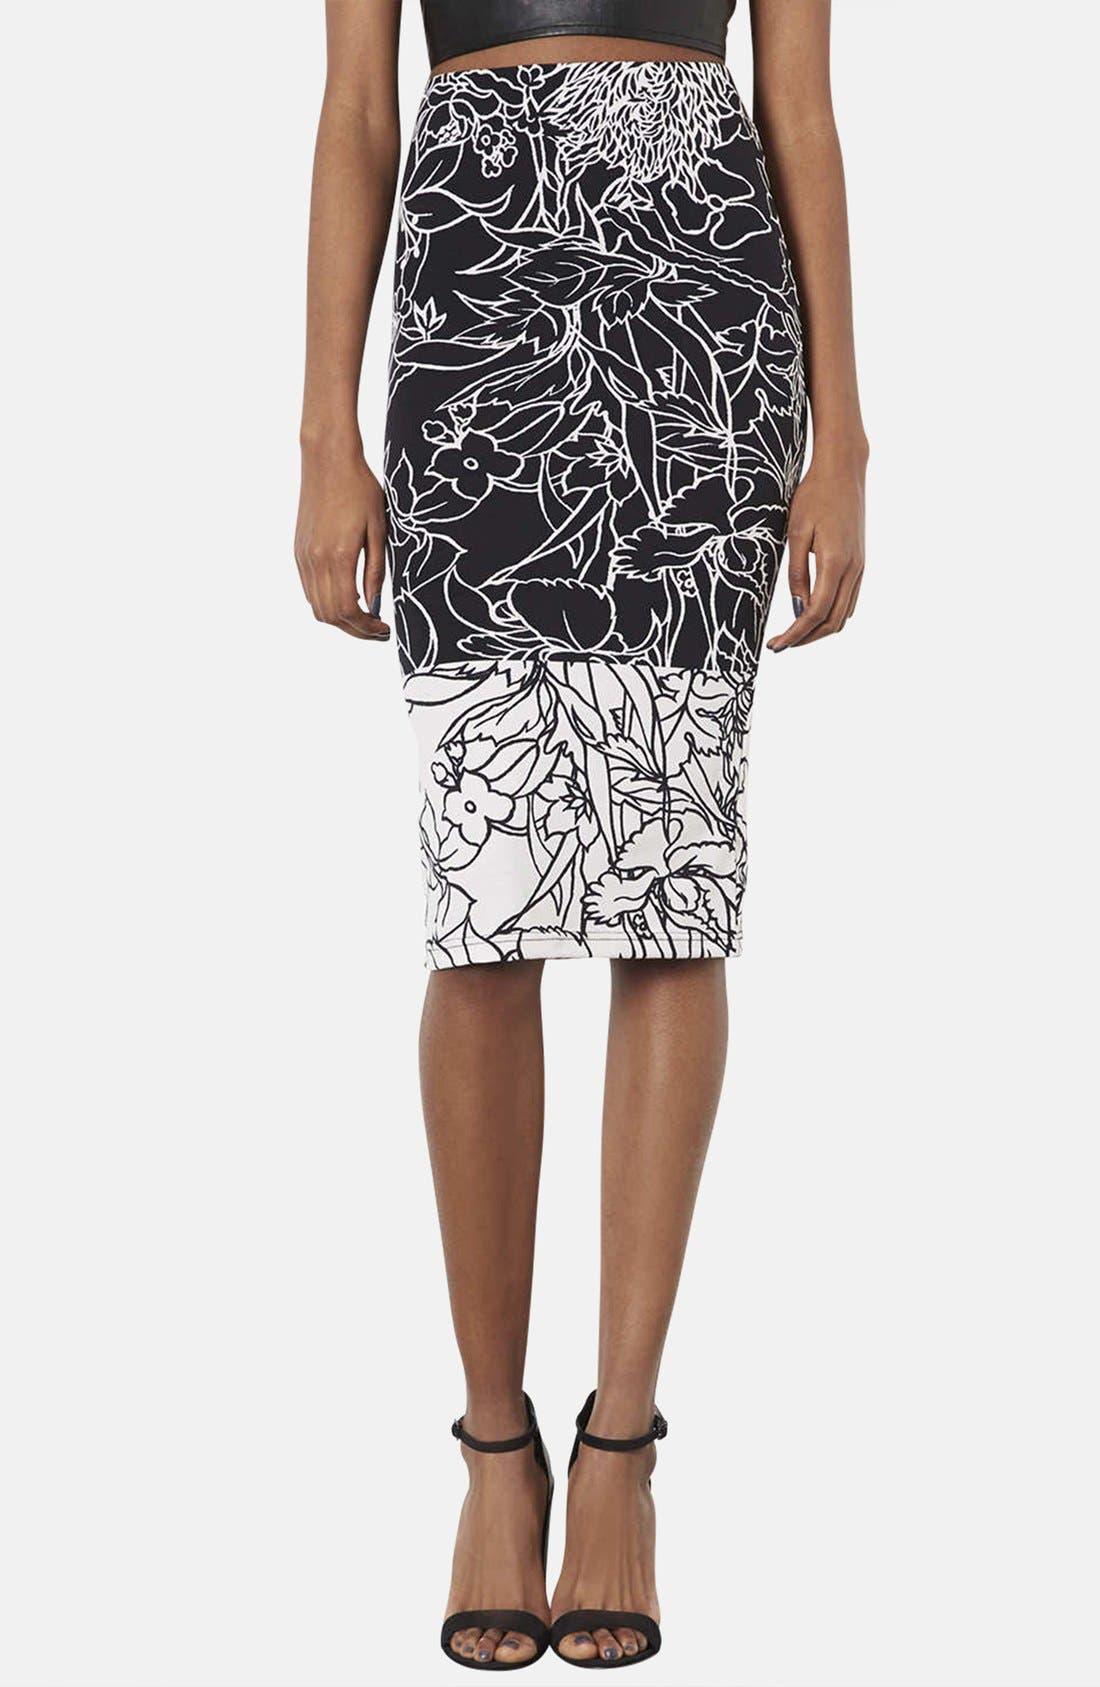 Alternate Image 1 Selected - Topshop 'Pen Garden' Floral Print Tube Skirt